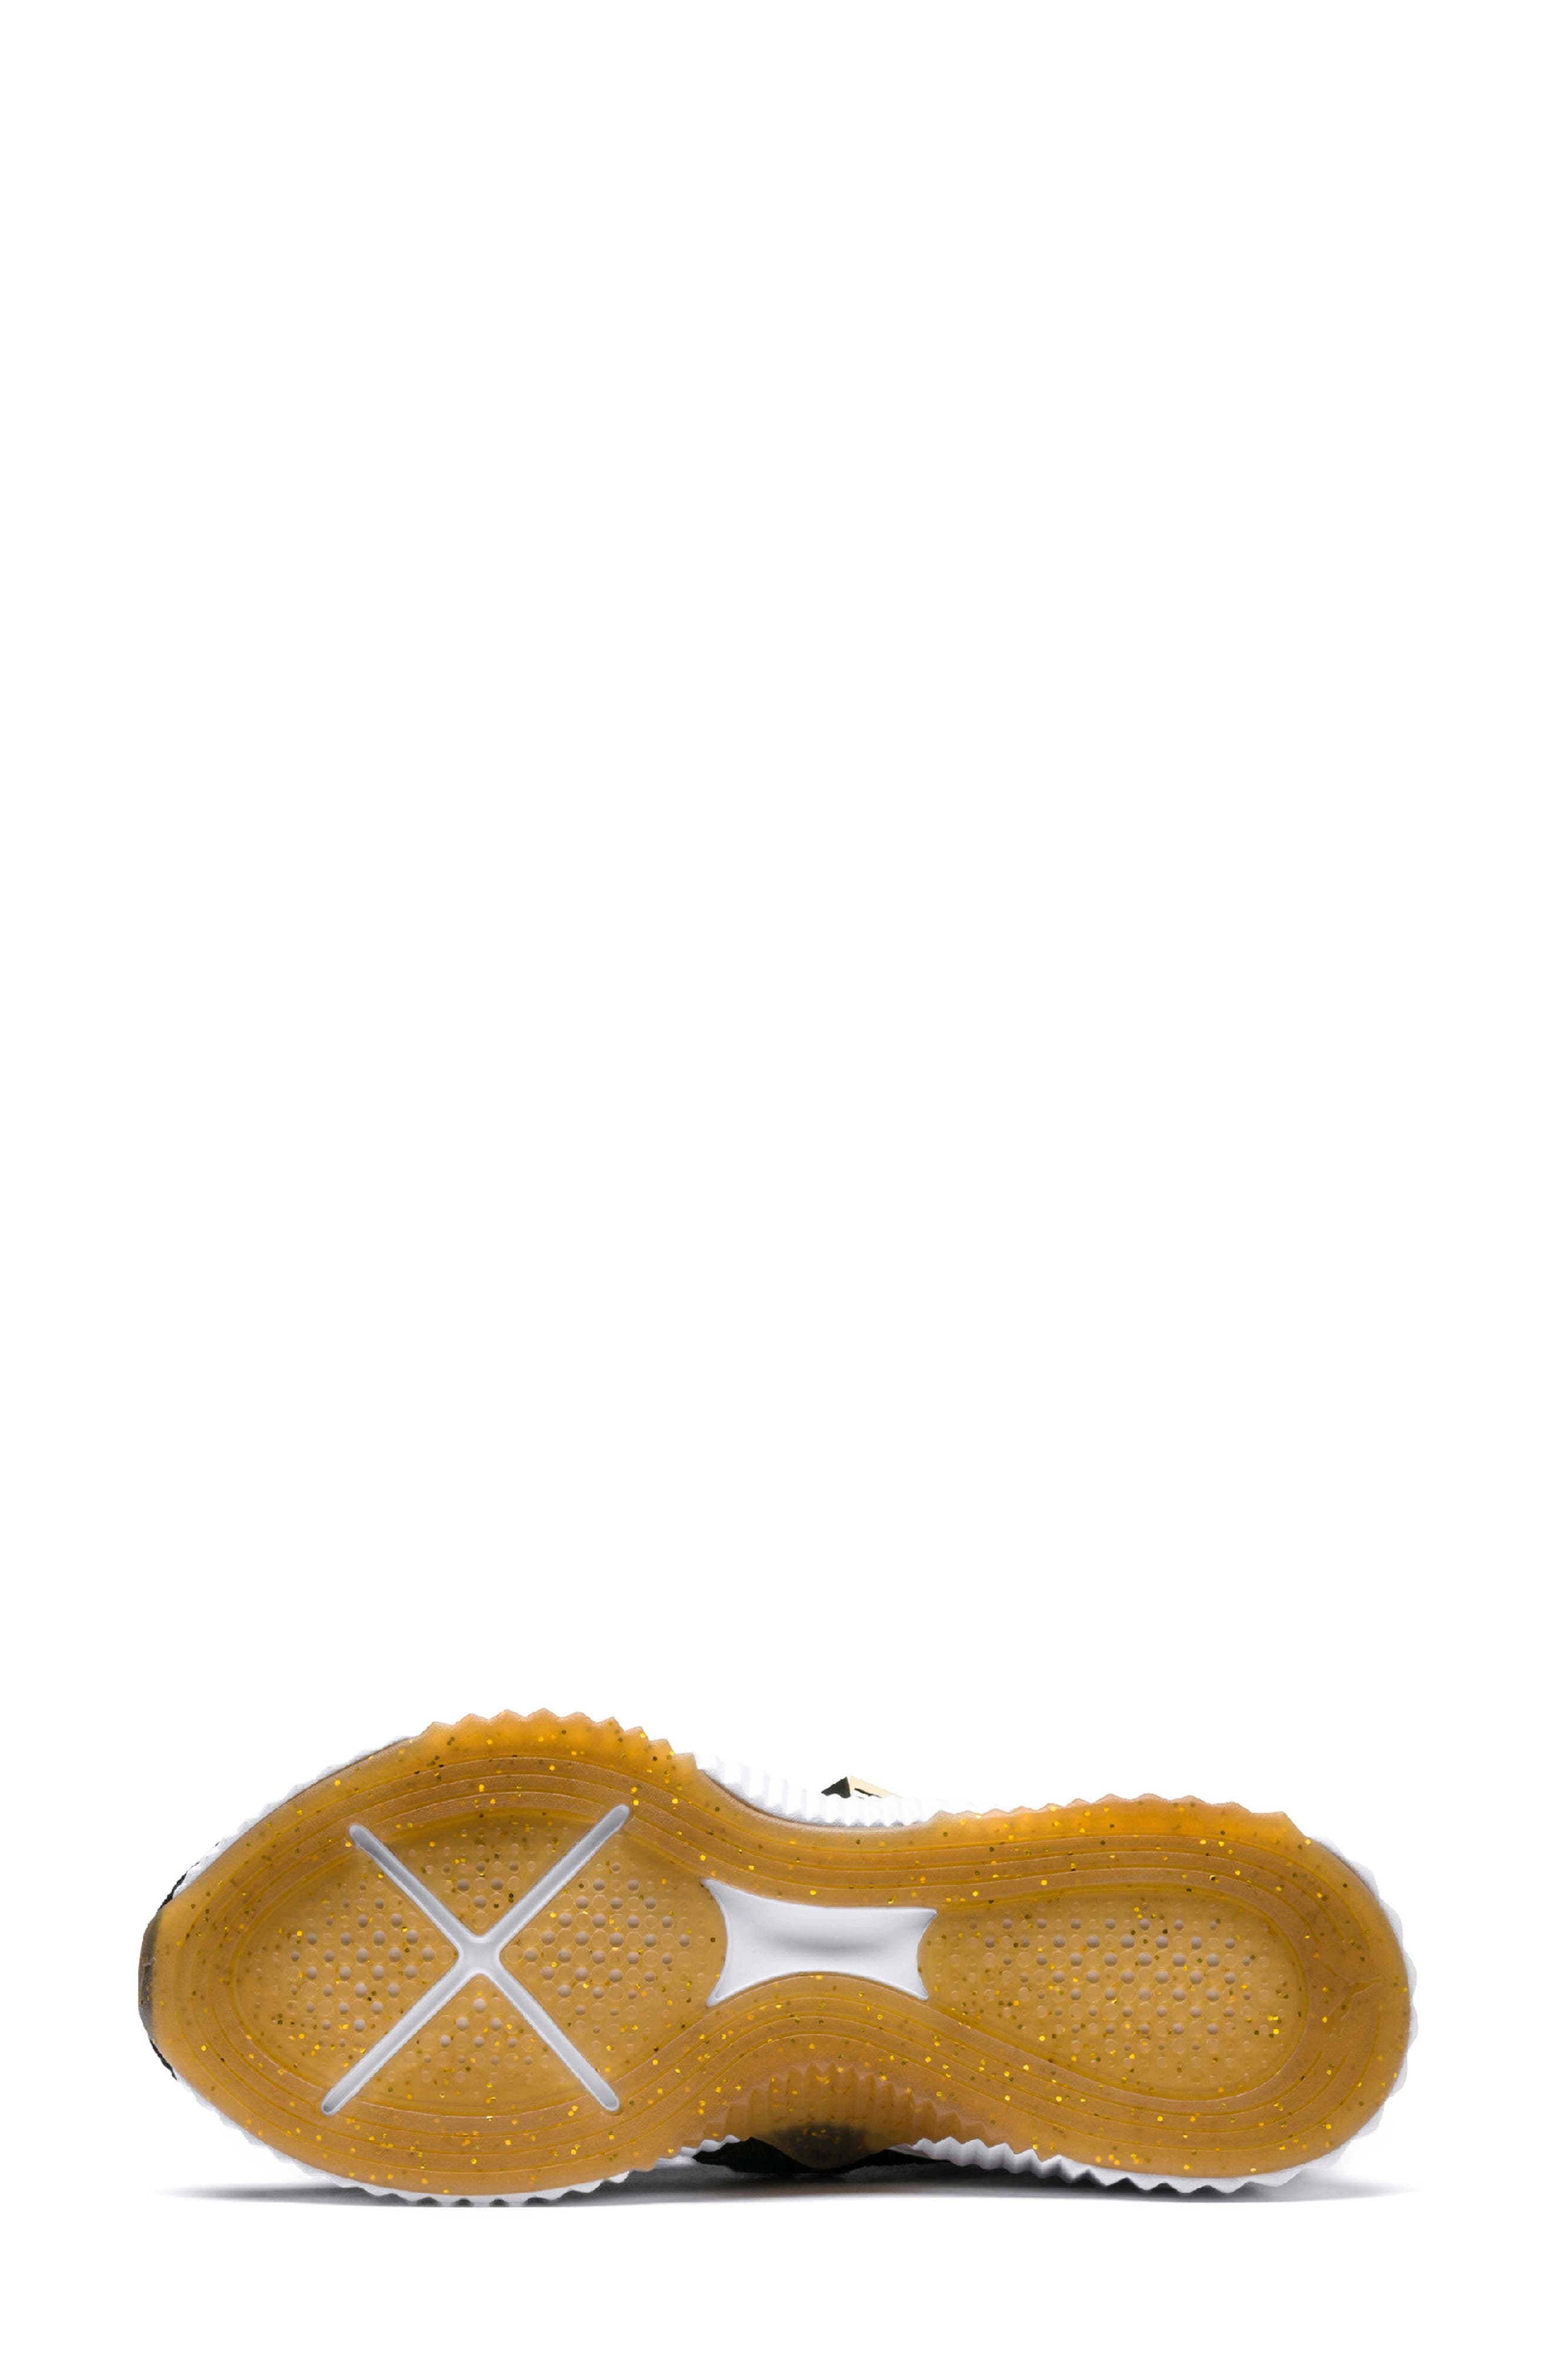 Defy Mid Varsity Sneaker,                             Alternate thumbnail 5, color,                             PUMA BLACK/ METALLIC GOLD